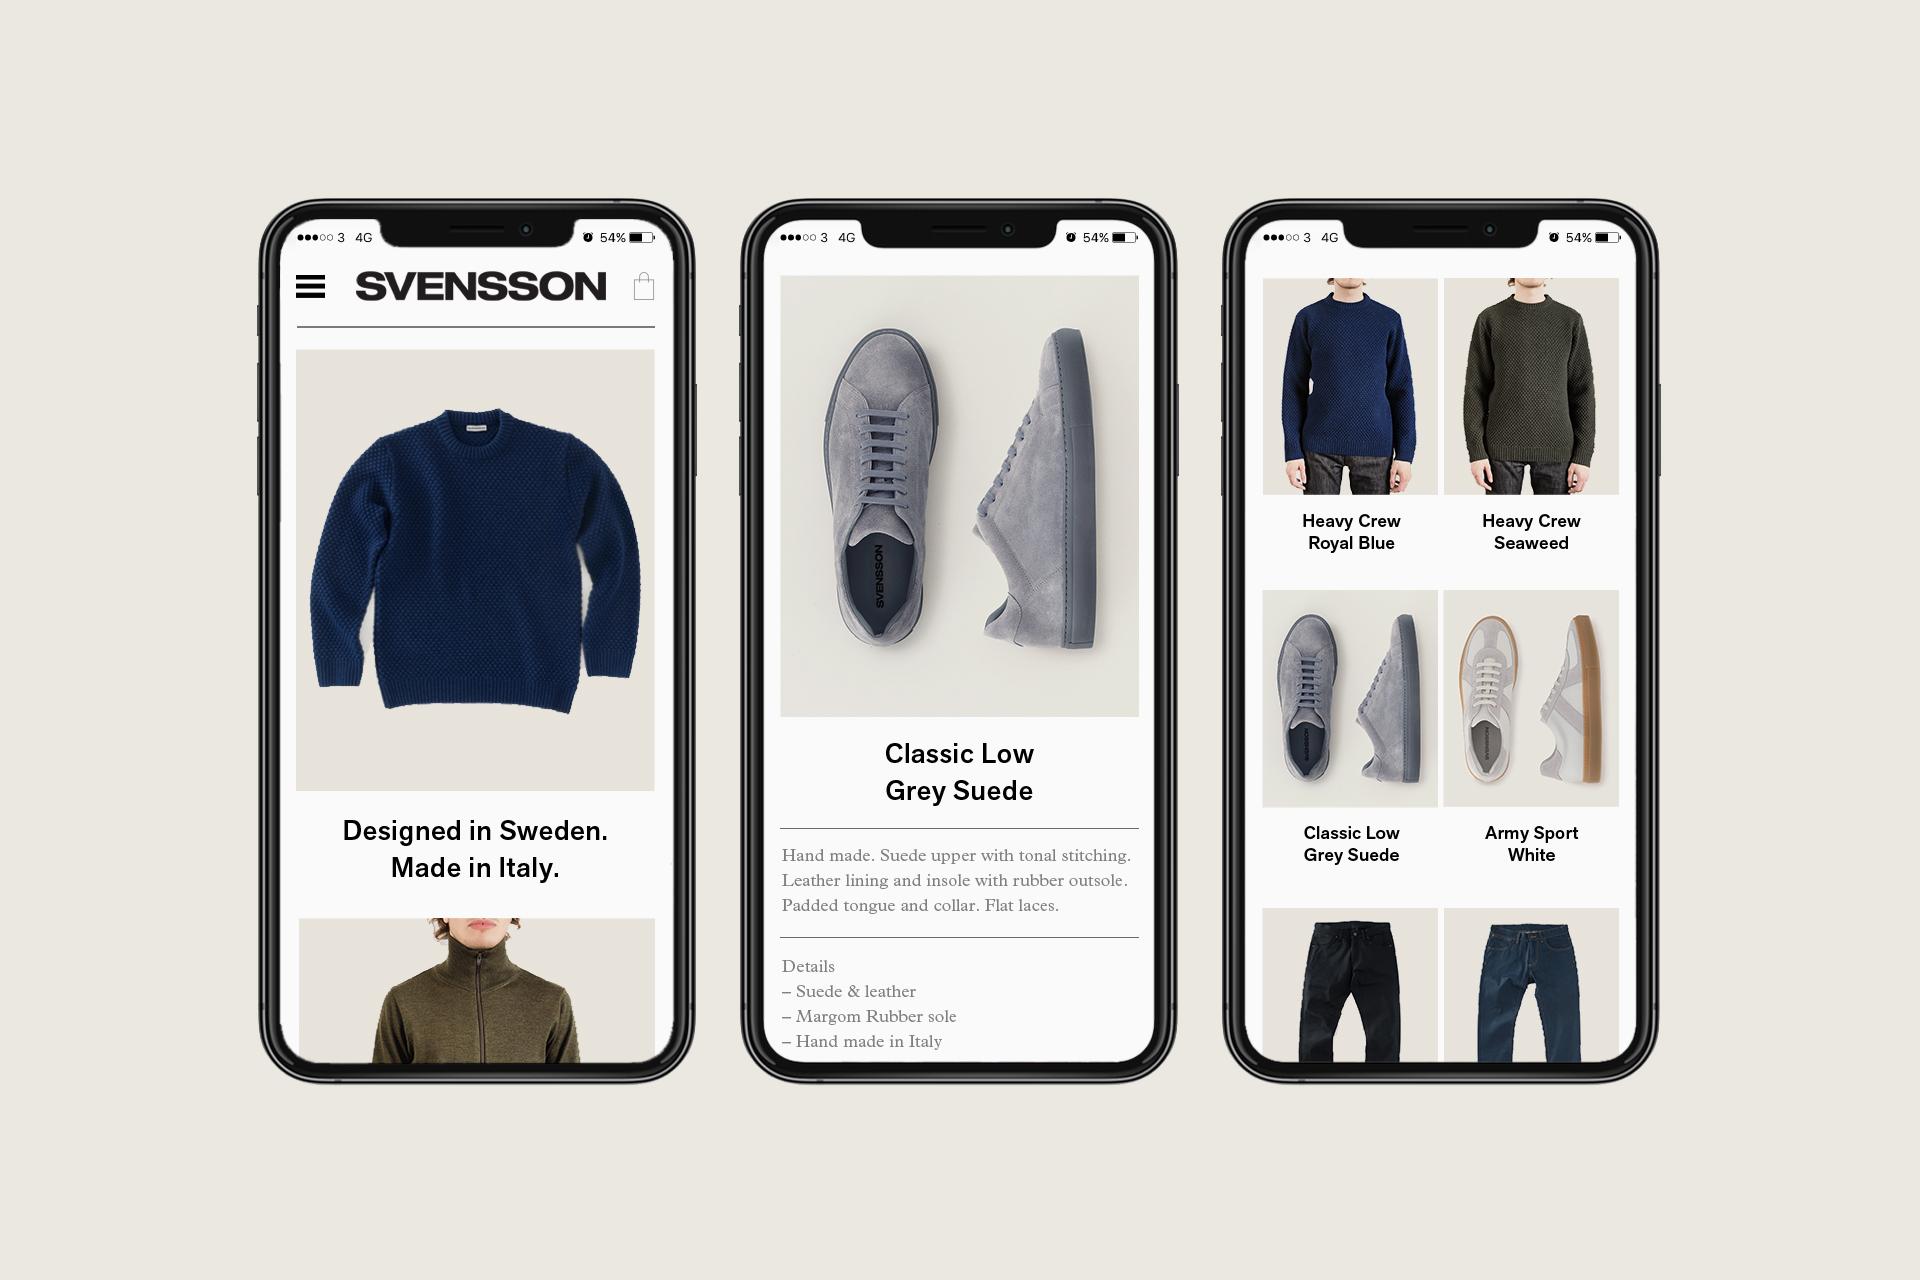 svensson-jeans-webshop-phone-01